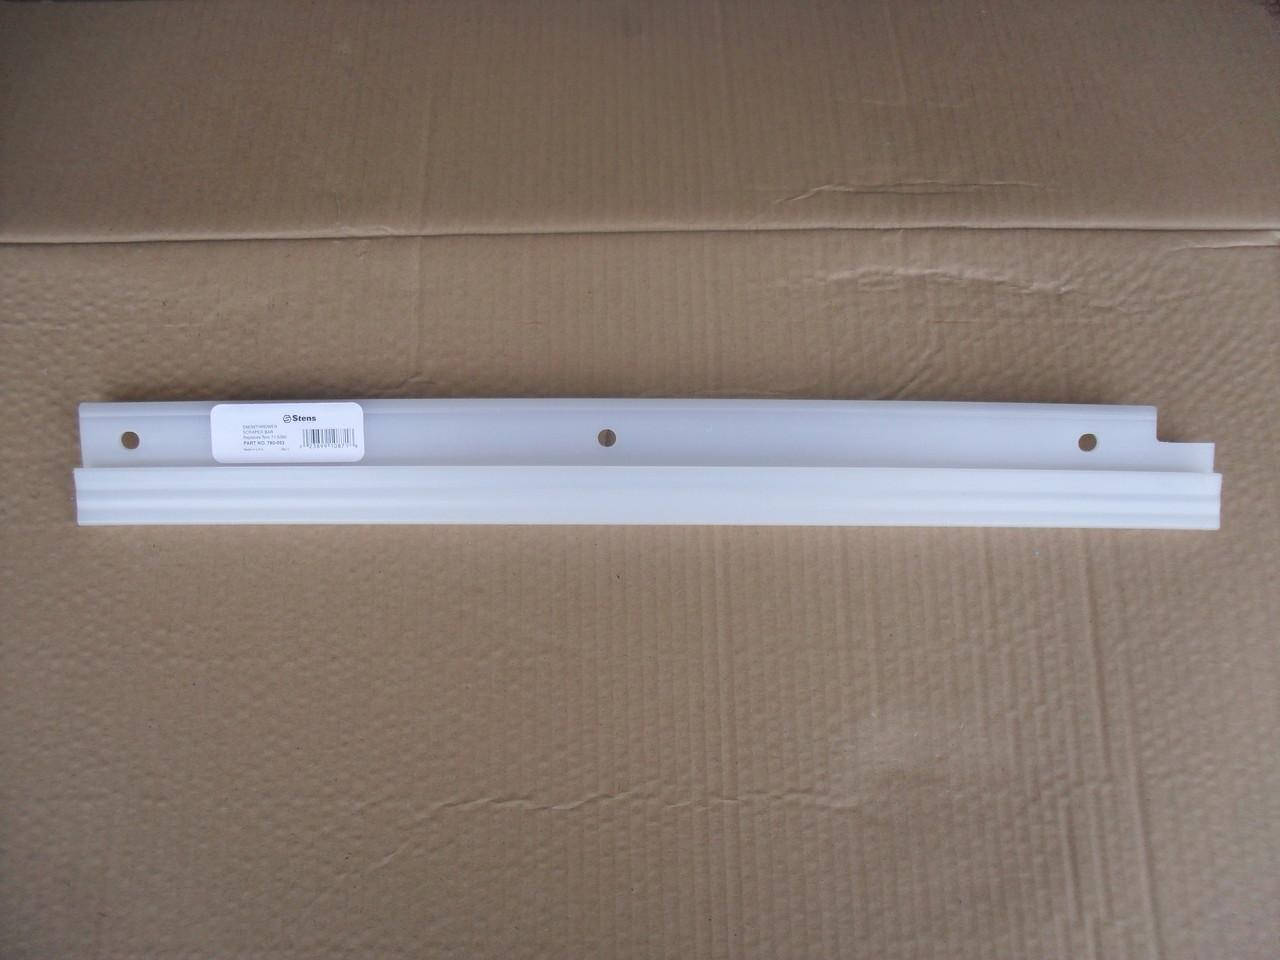 Scraper Bar for Lawn Boy 320R, 320E, 715390, 71-5390 Snowthrower, Made In USA, snowblower, snow thrower blower, lawnboy